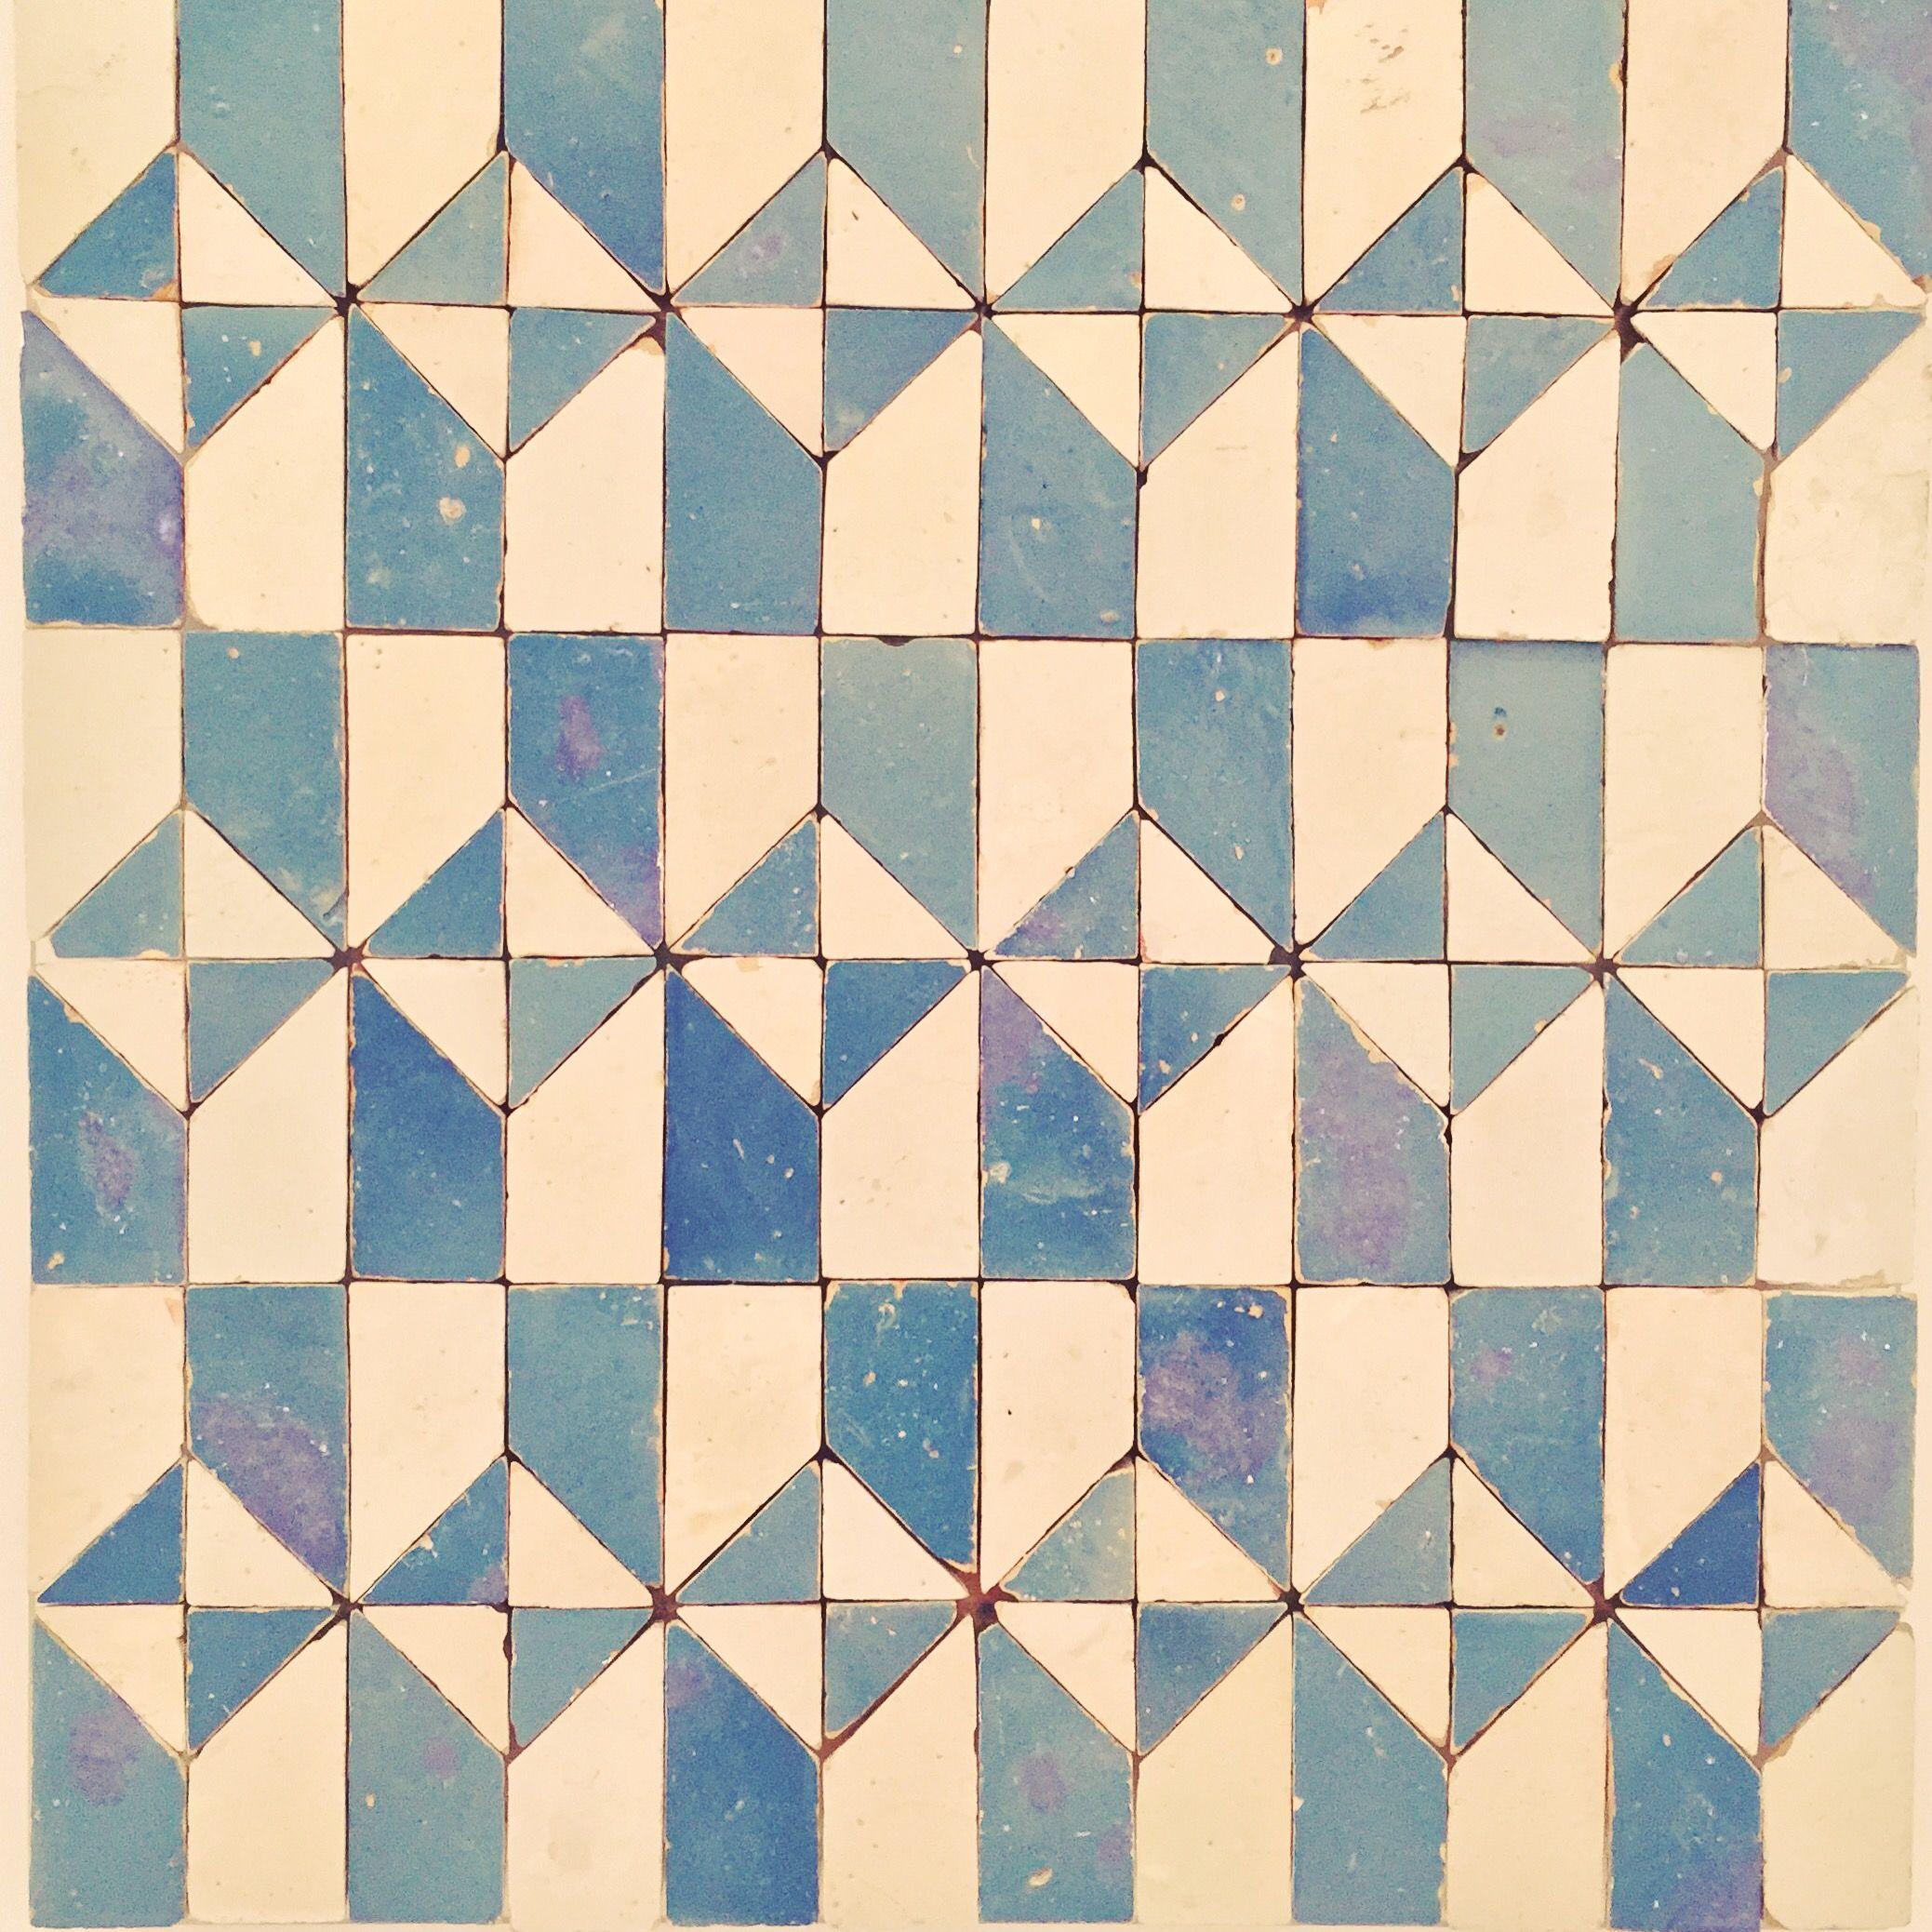 Azulejos, 15thc, Portugal | Tiles | Pinterest | Portuguese tiles ...